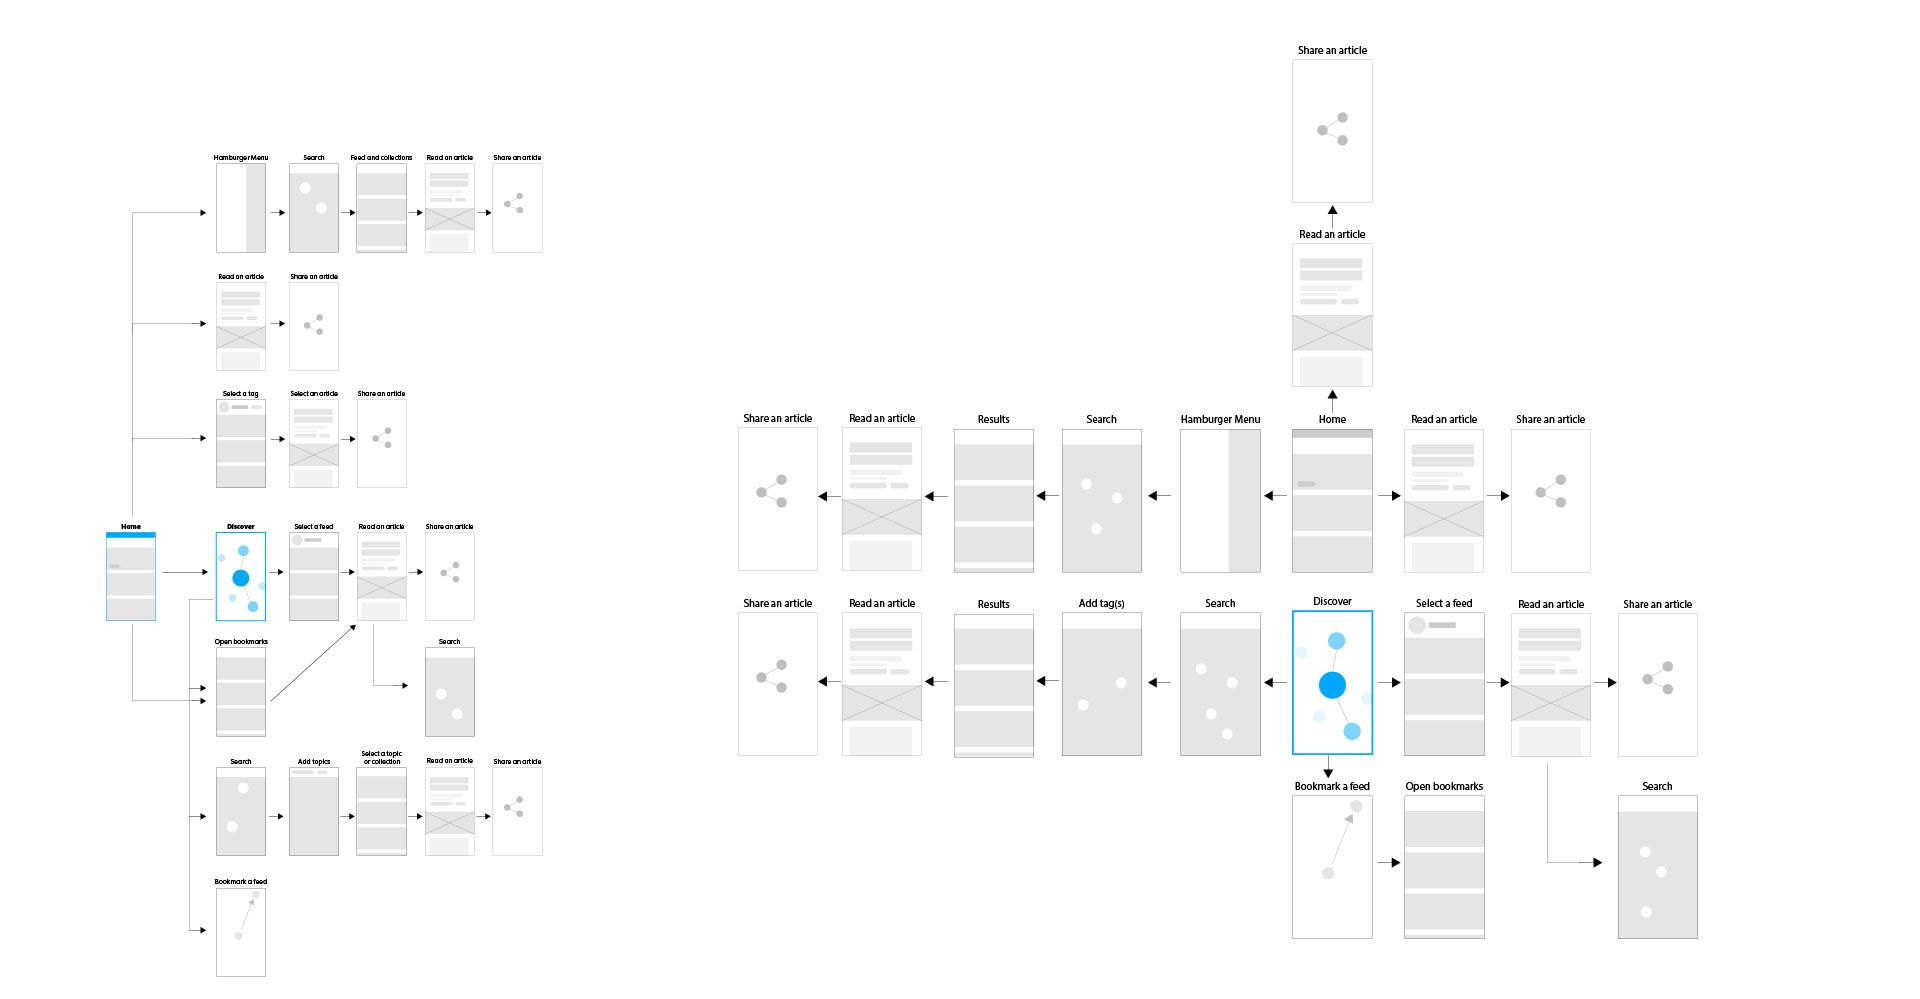 USAToday_interactionMap